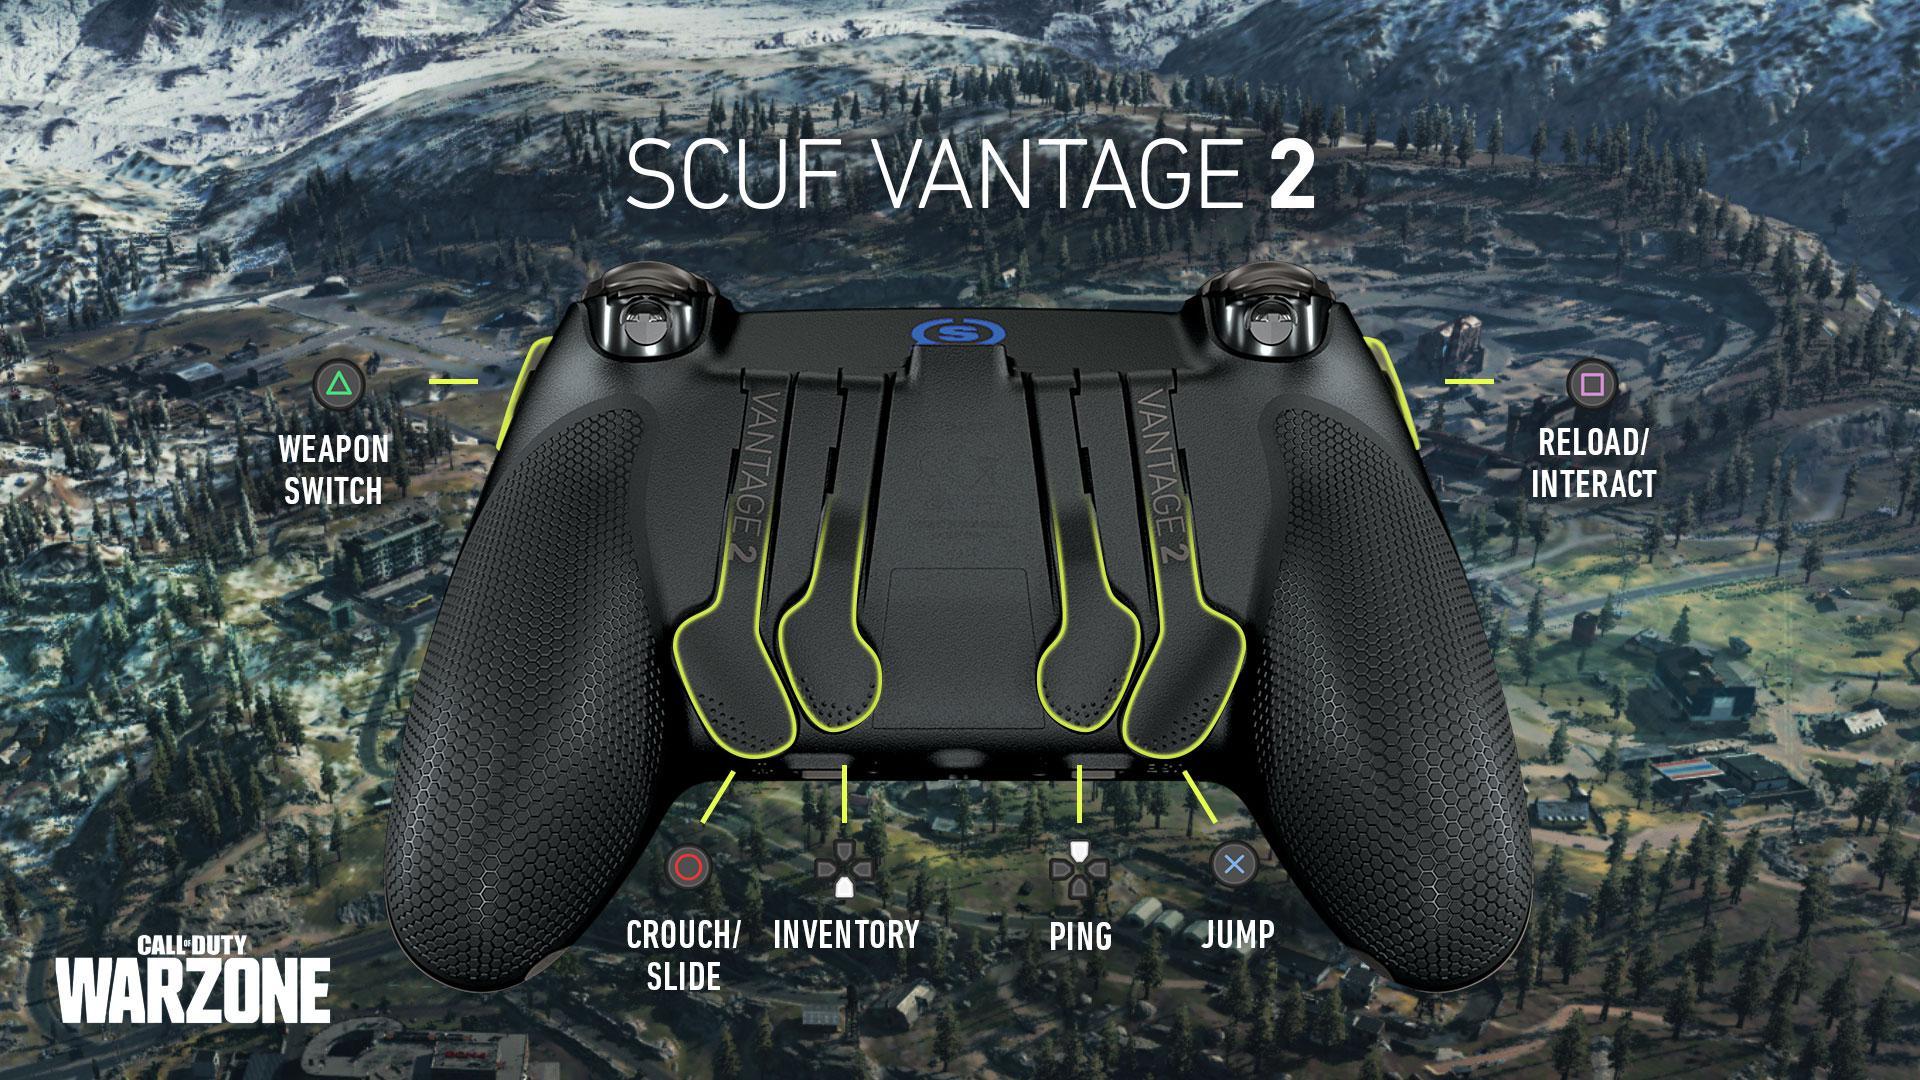 SCUF Vantage 2 COD Warzone PS4 Controller Setup